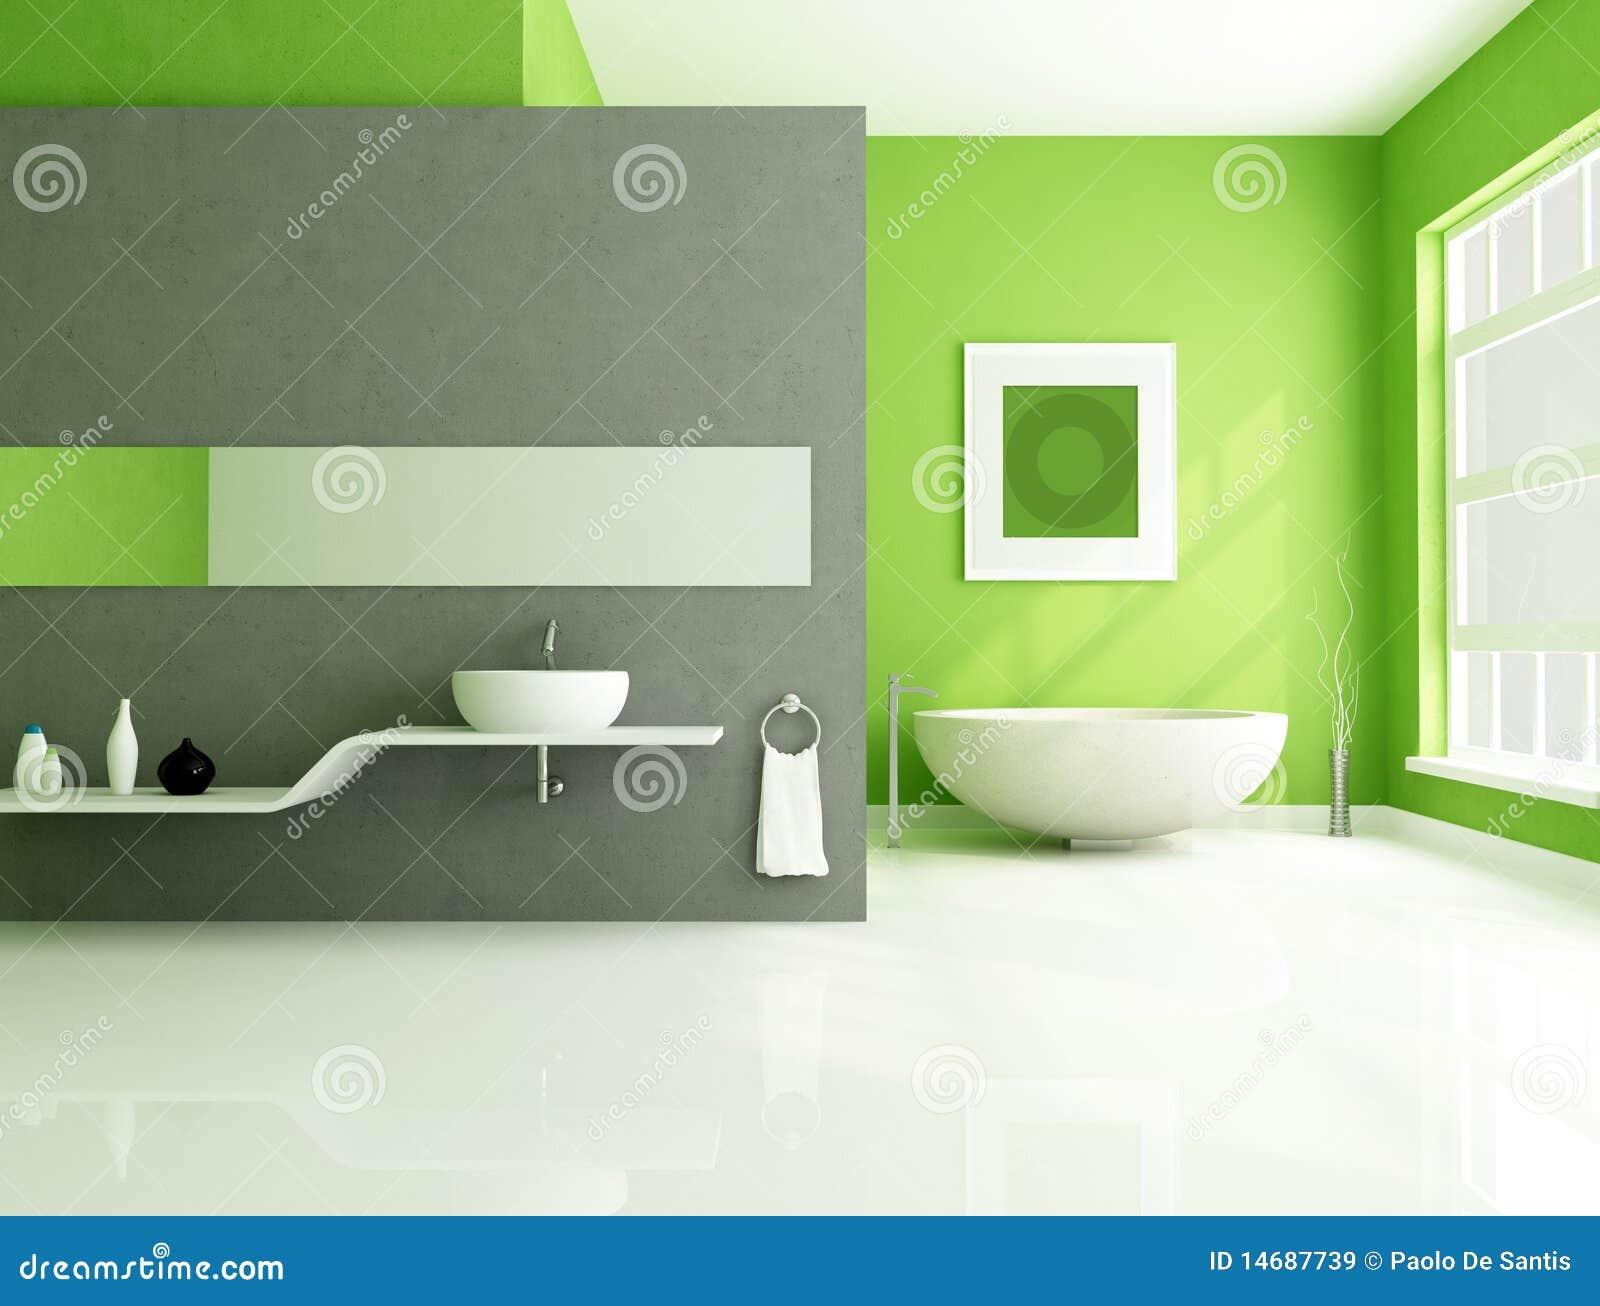 Salle de bain verte et blanc – lombards